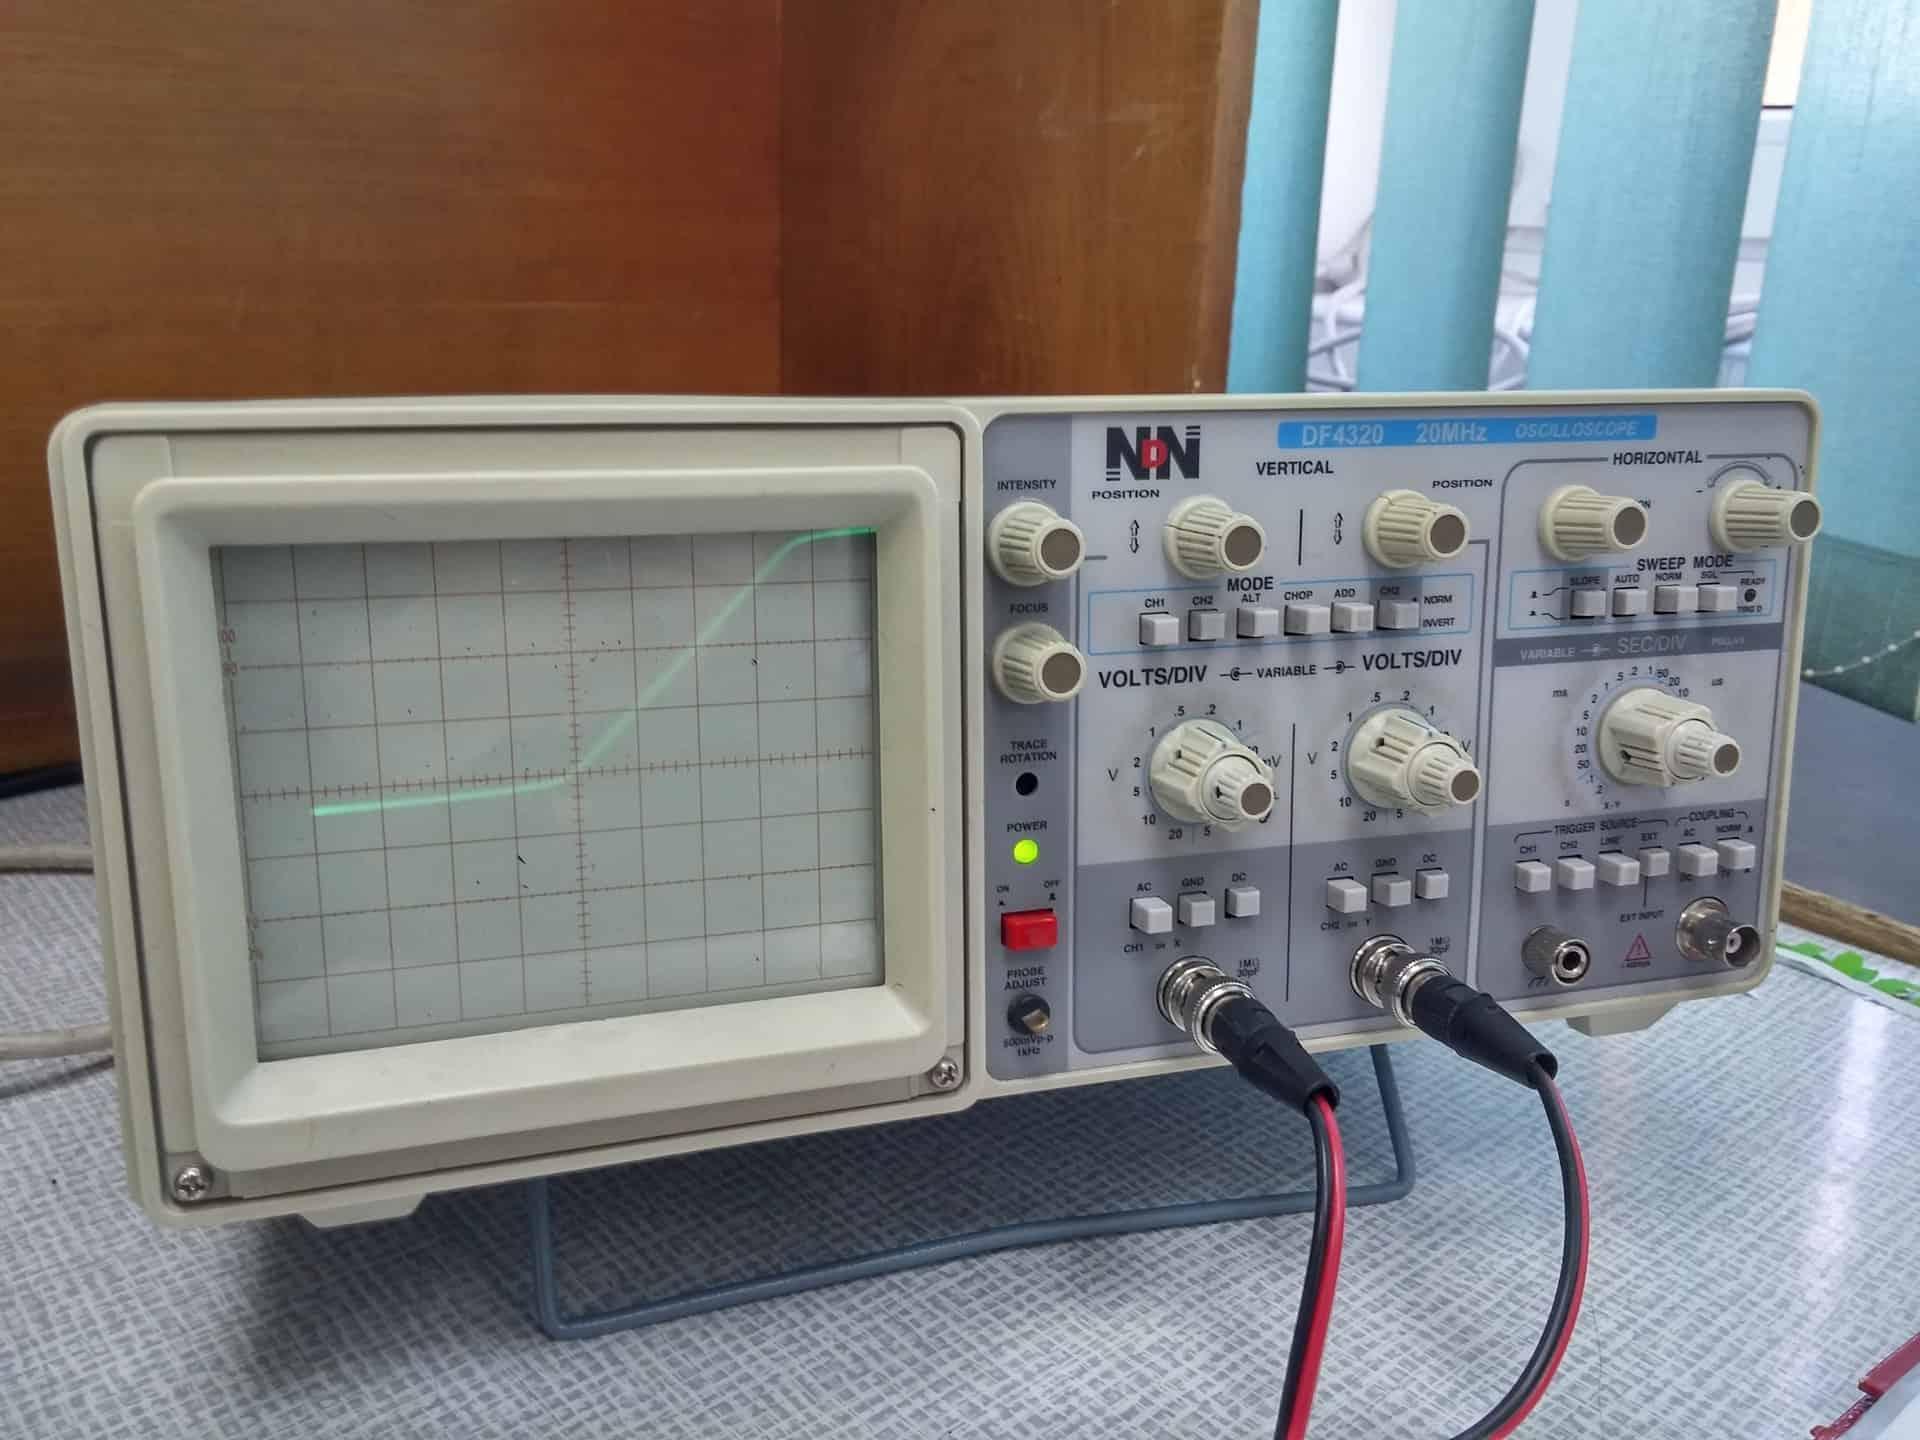 Osciloscópio clássico de bancada analógico.